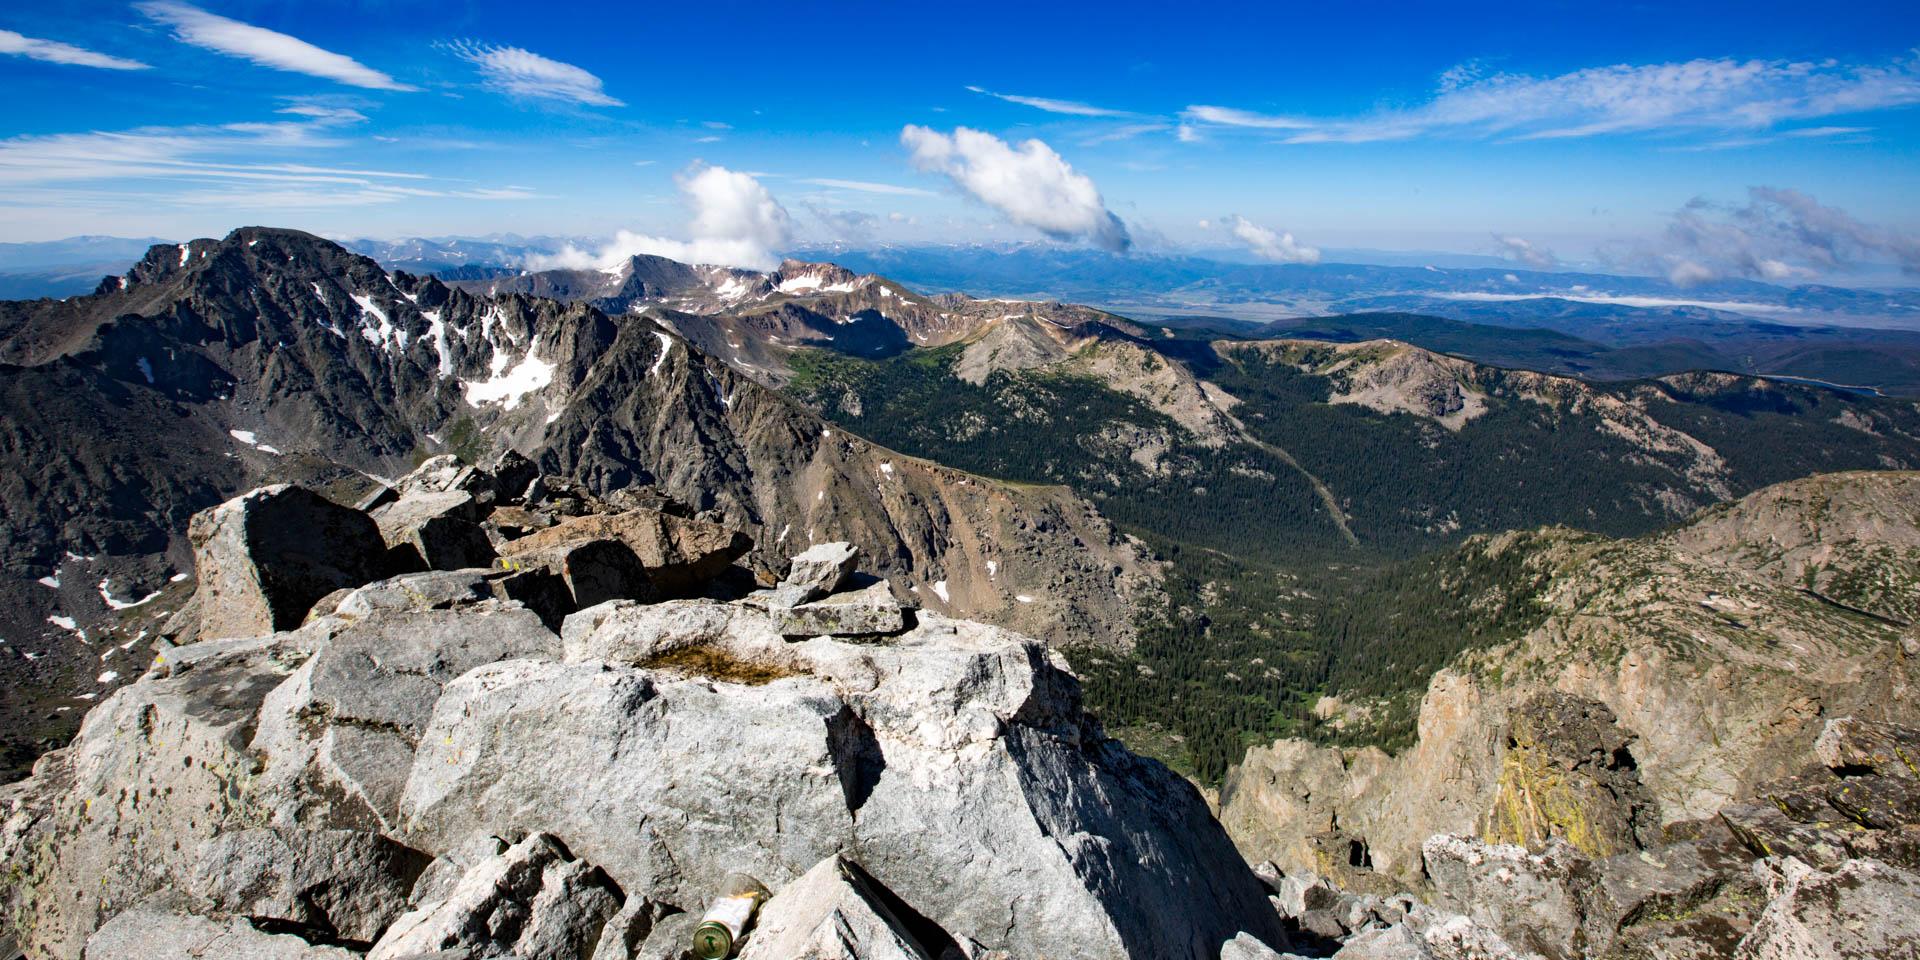 View from Navajo Peak